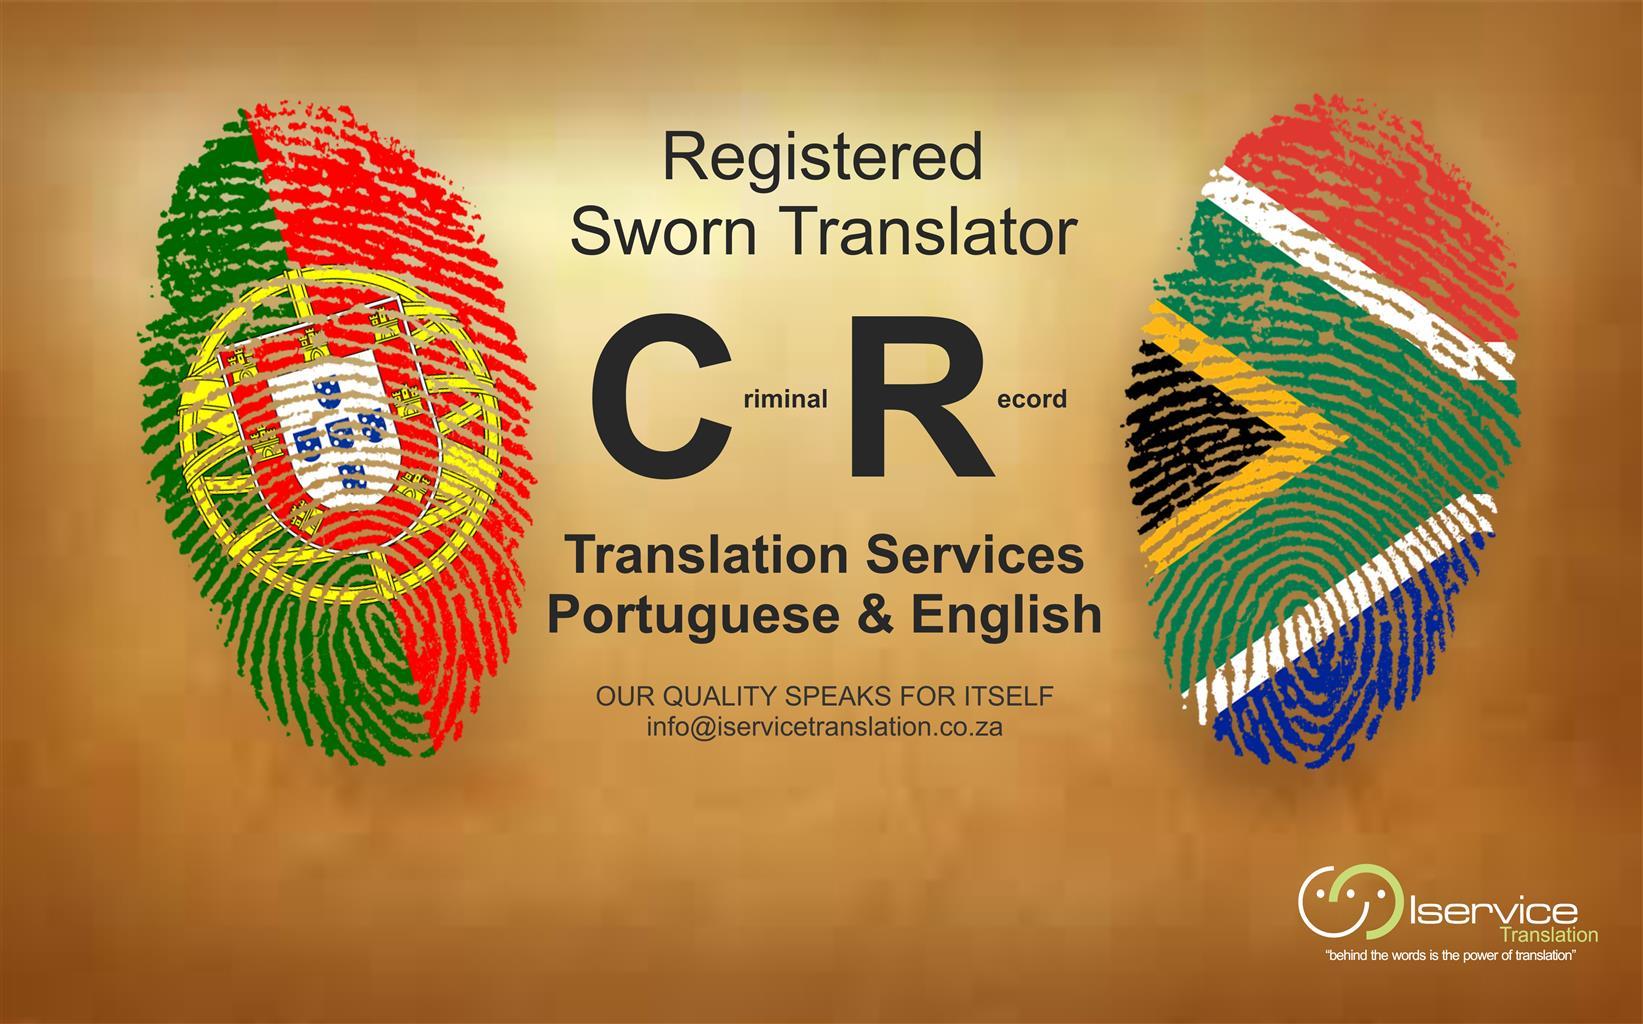 Criminal Record Translation Services - Portuguese and English